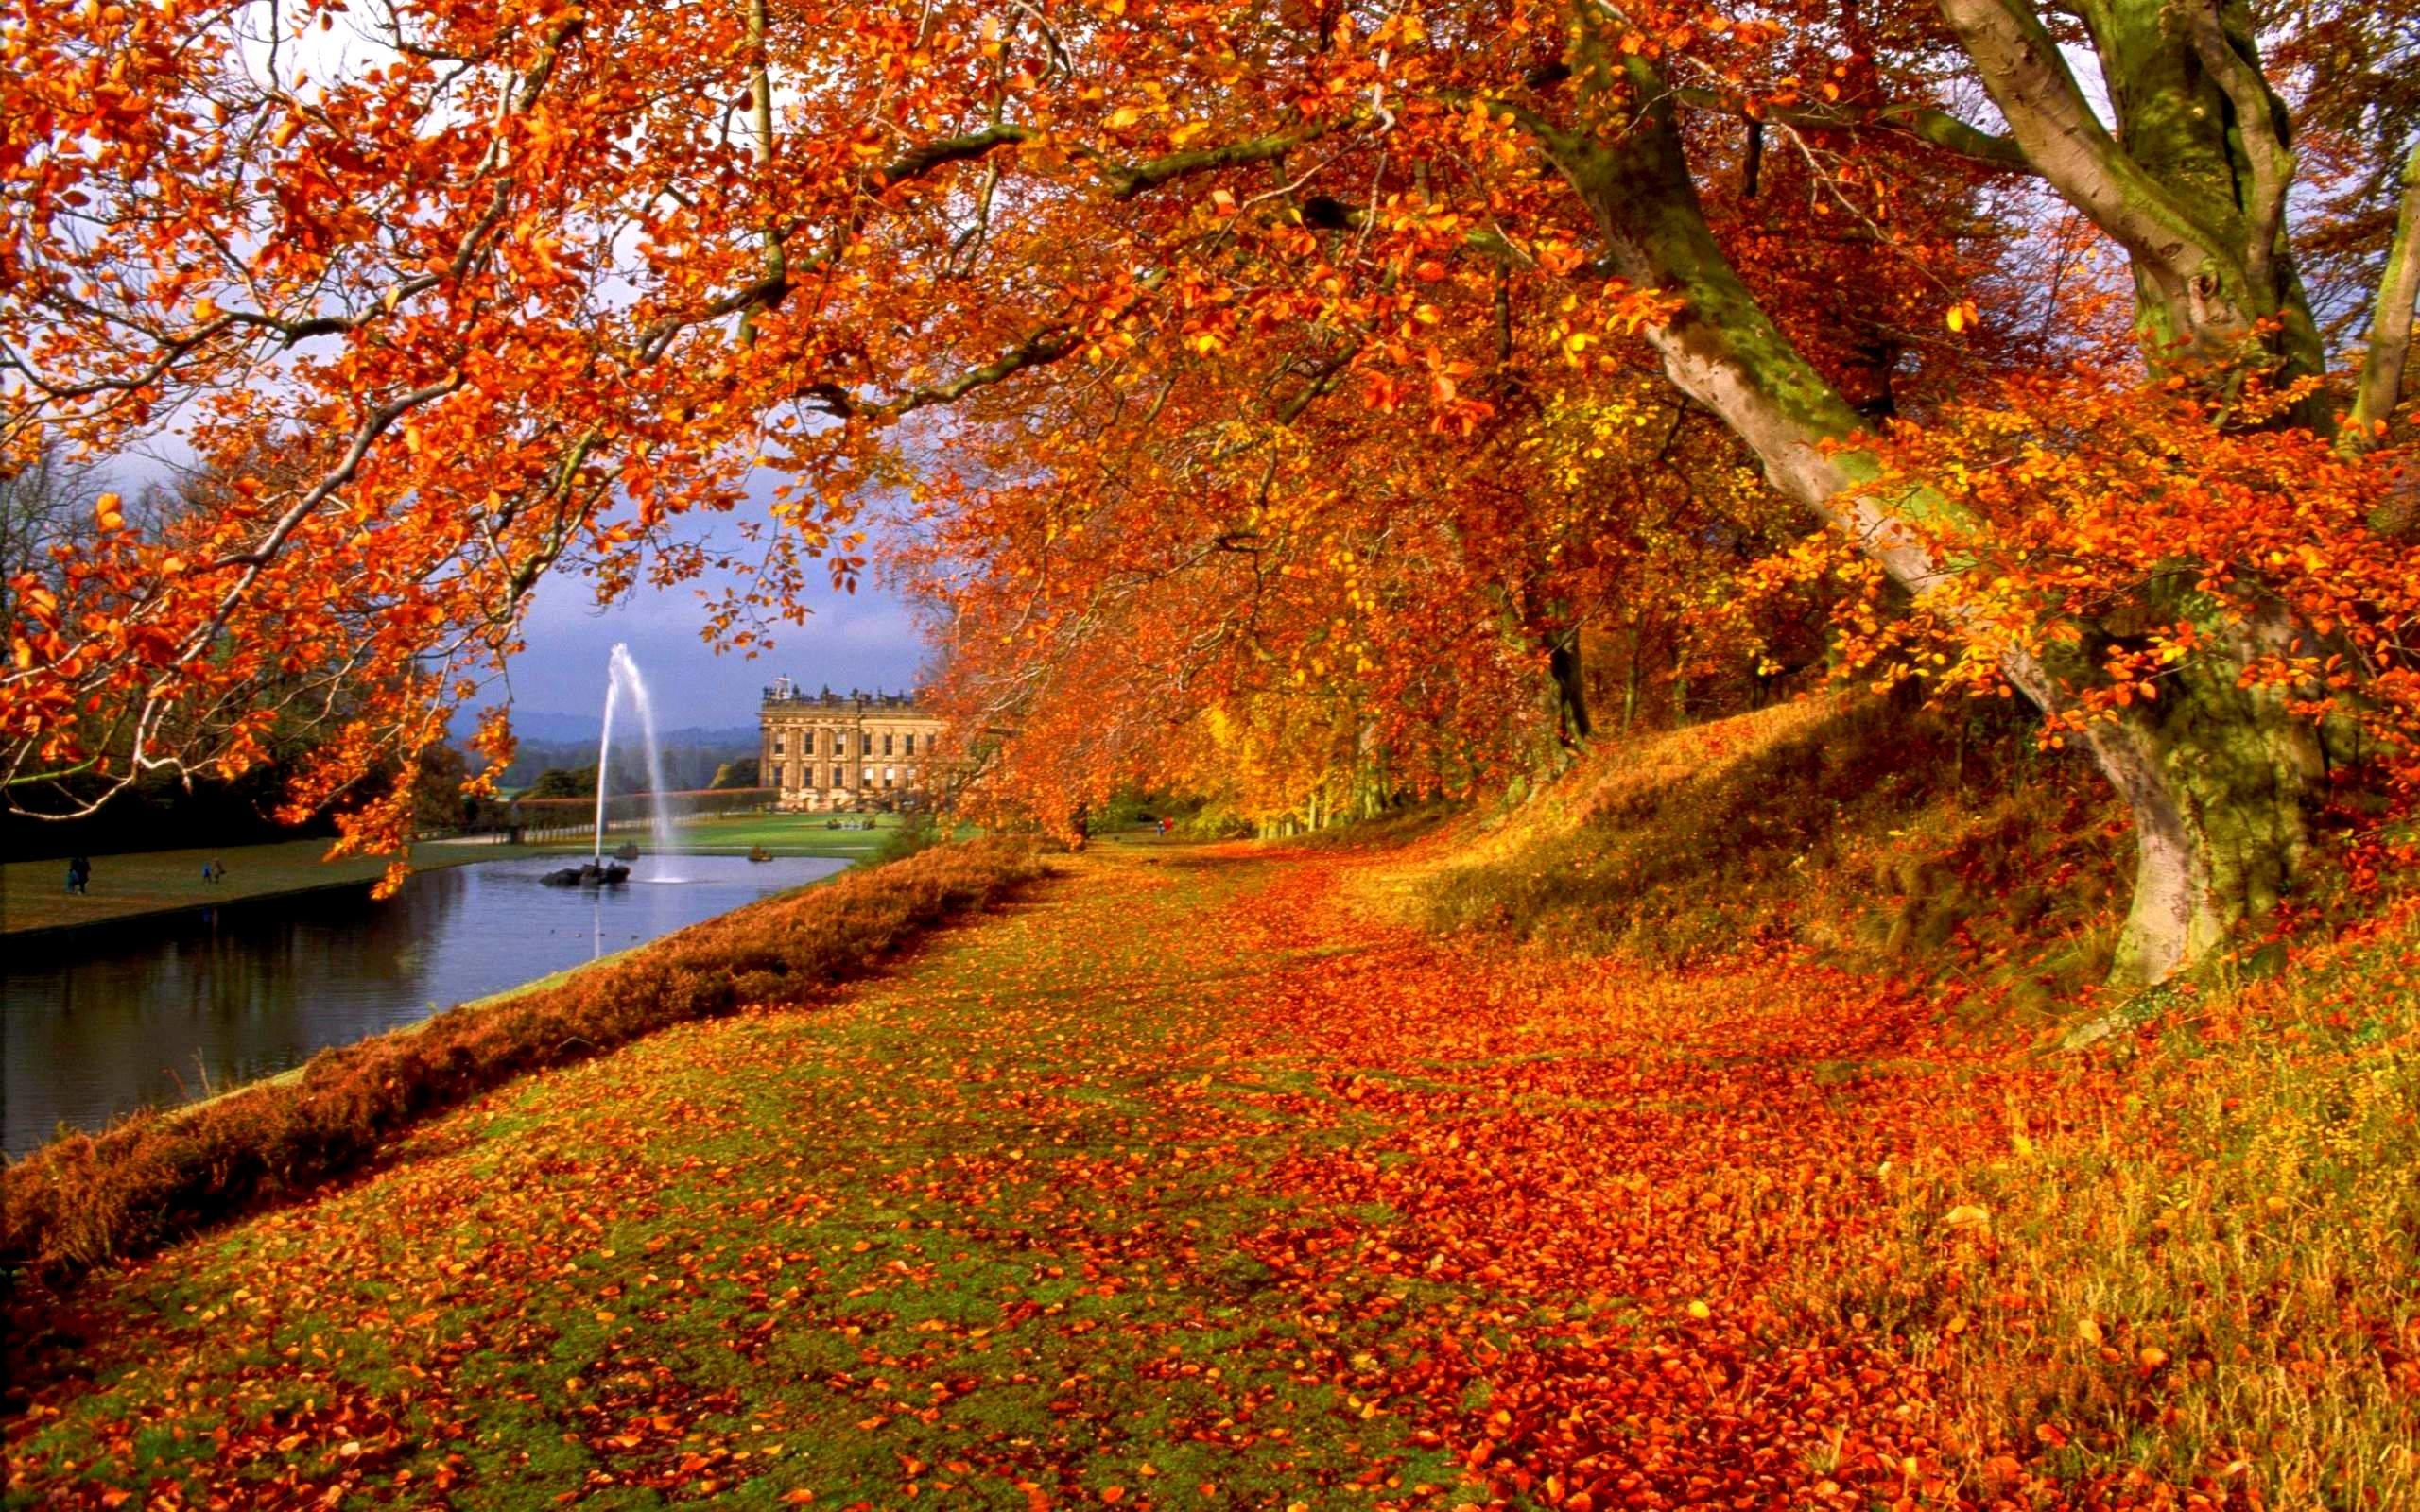 Autumn Background 61 images 2560x1600